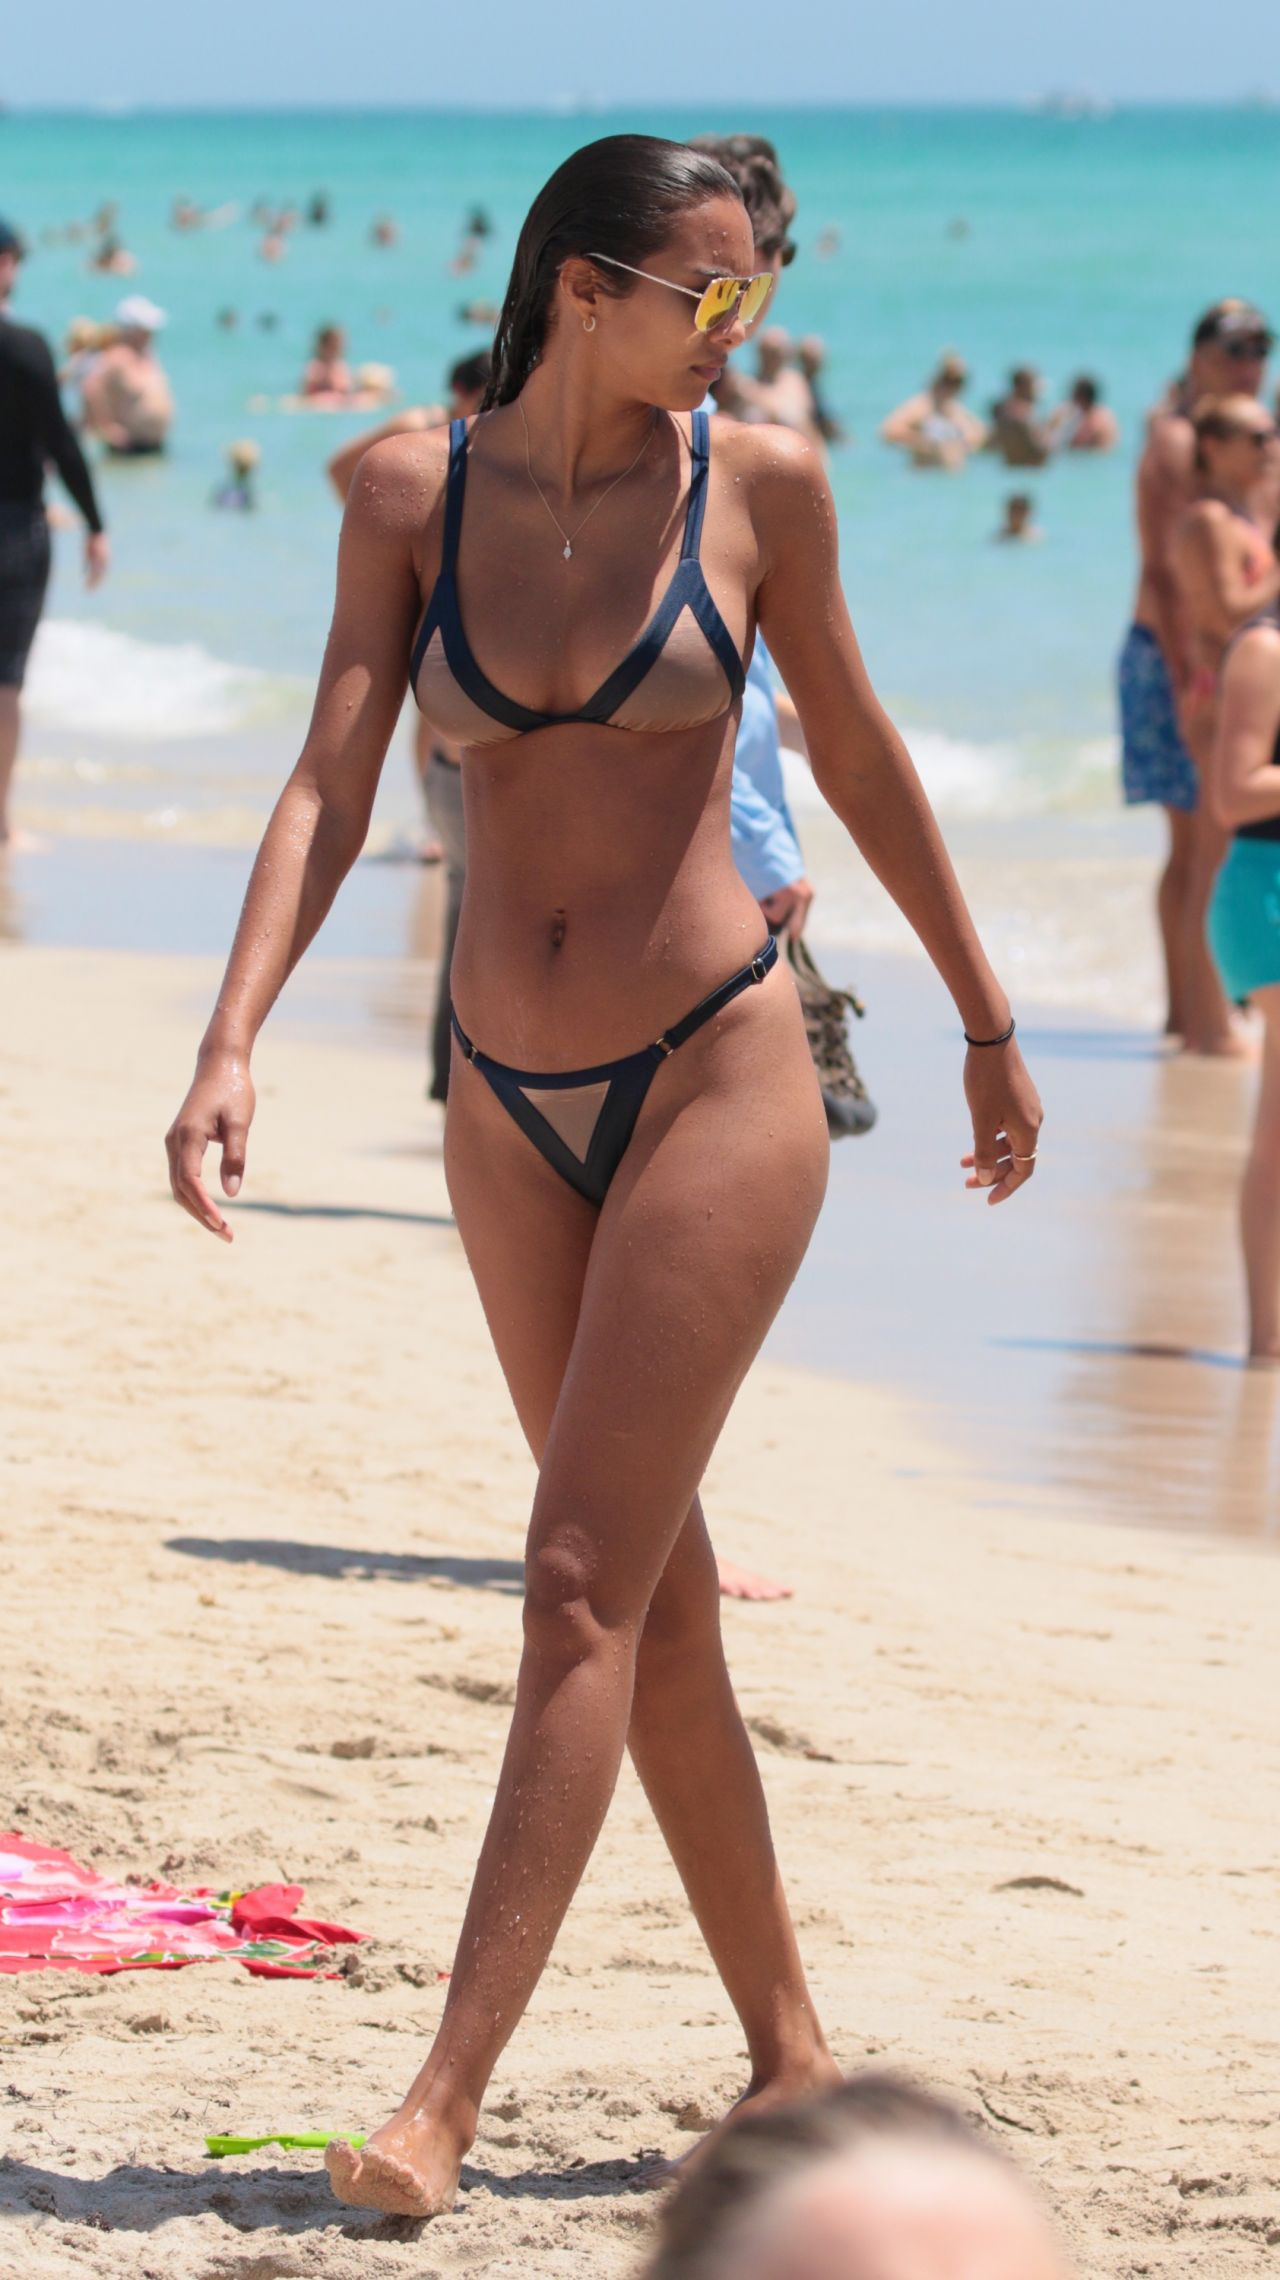 lais ribeiro v bikini free people